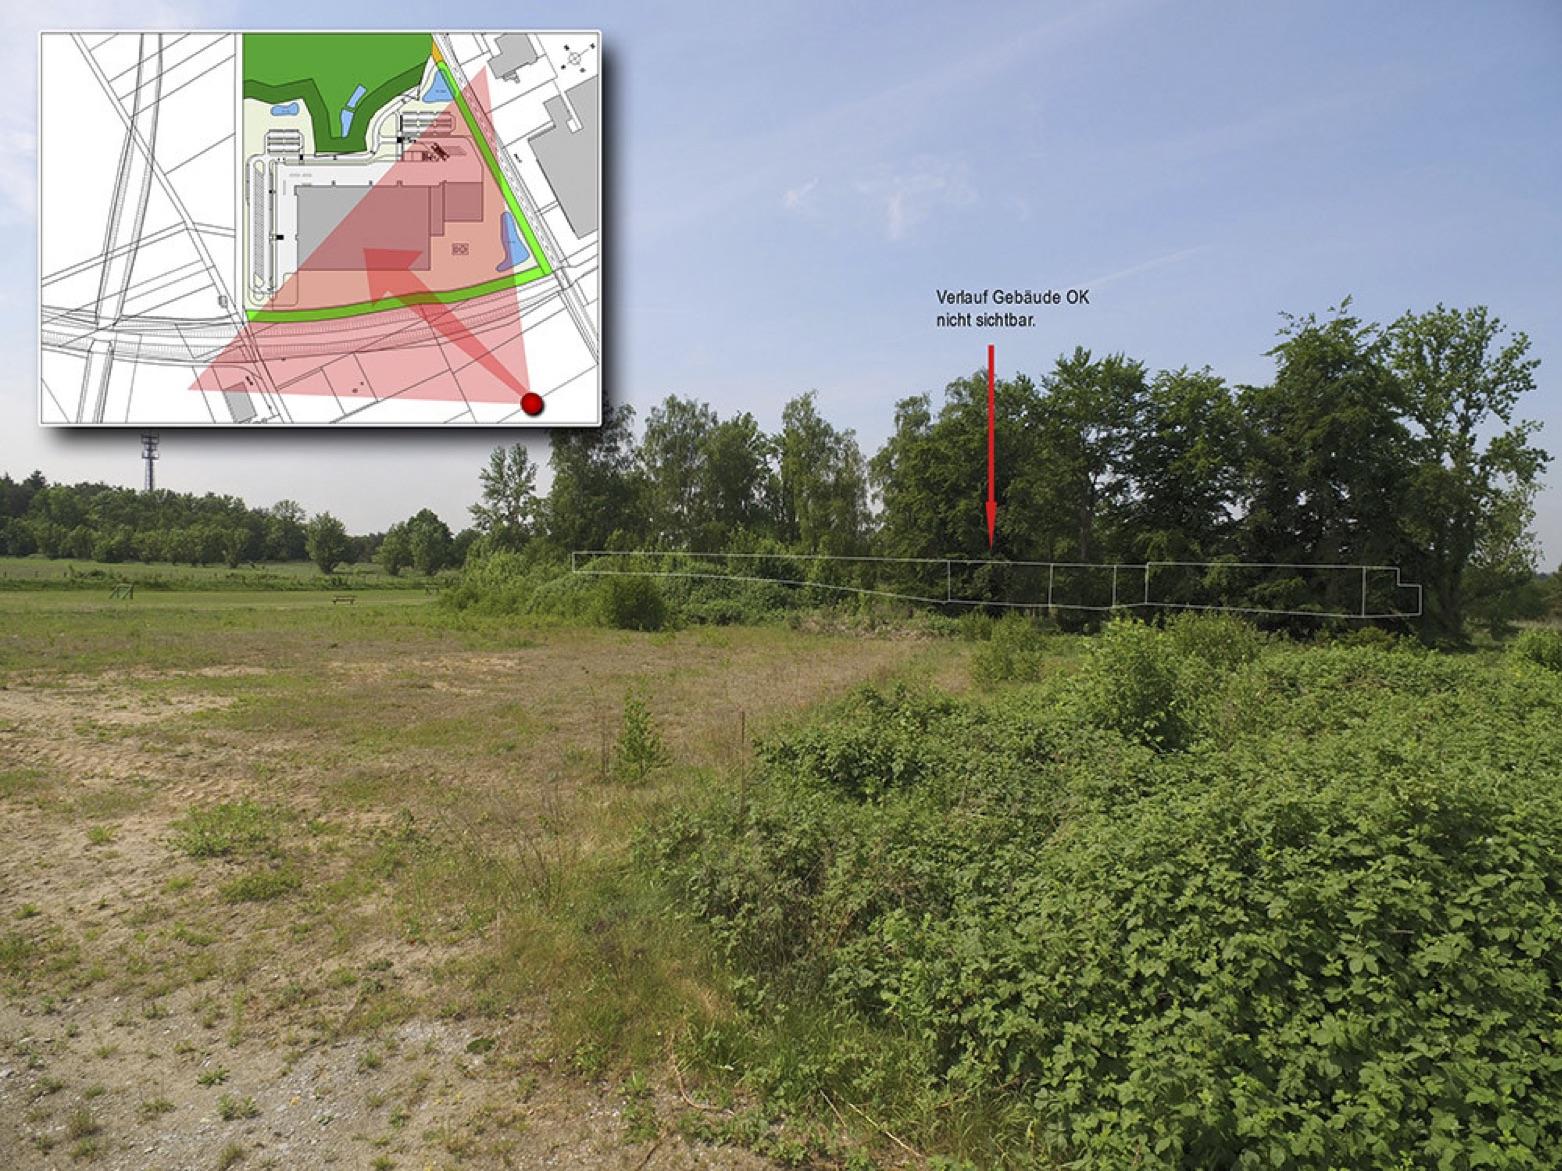 Ansicht aus dem Wohngebiet Oldendoerpsfeld-West in Richtung des Logistikzentrums